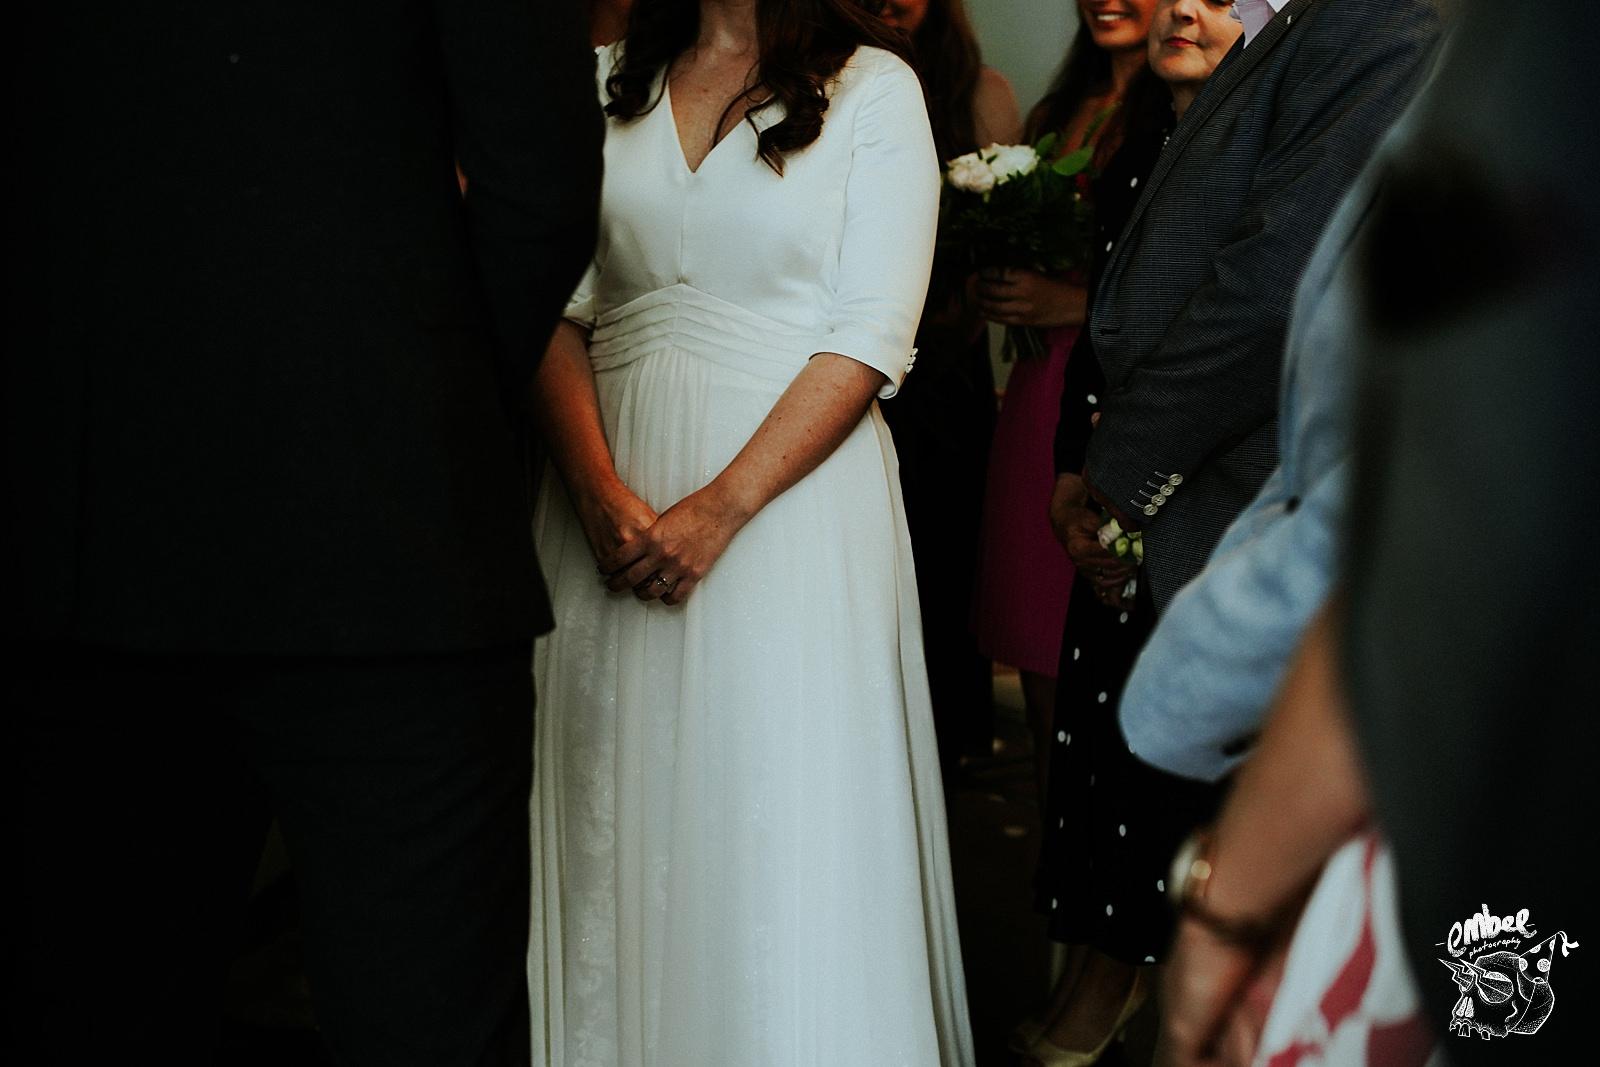 brides hands